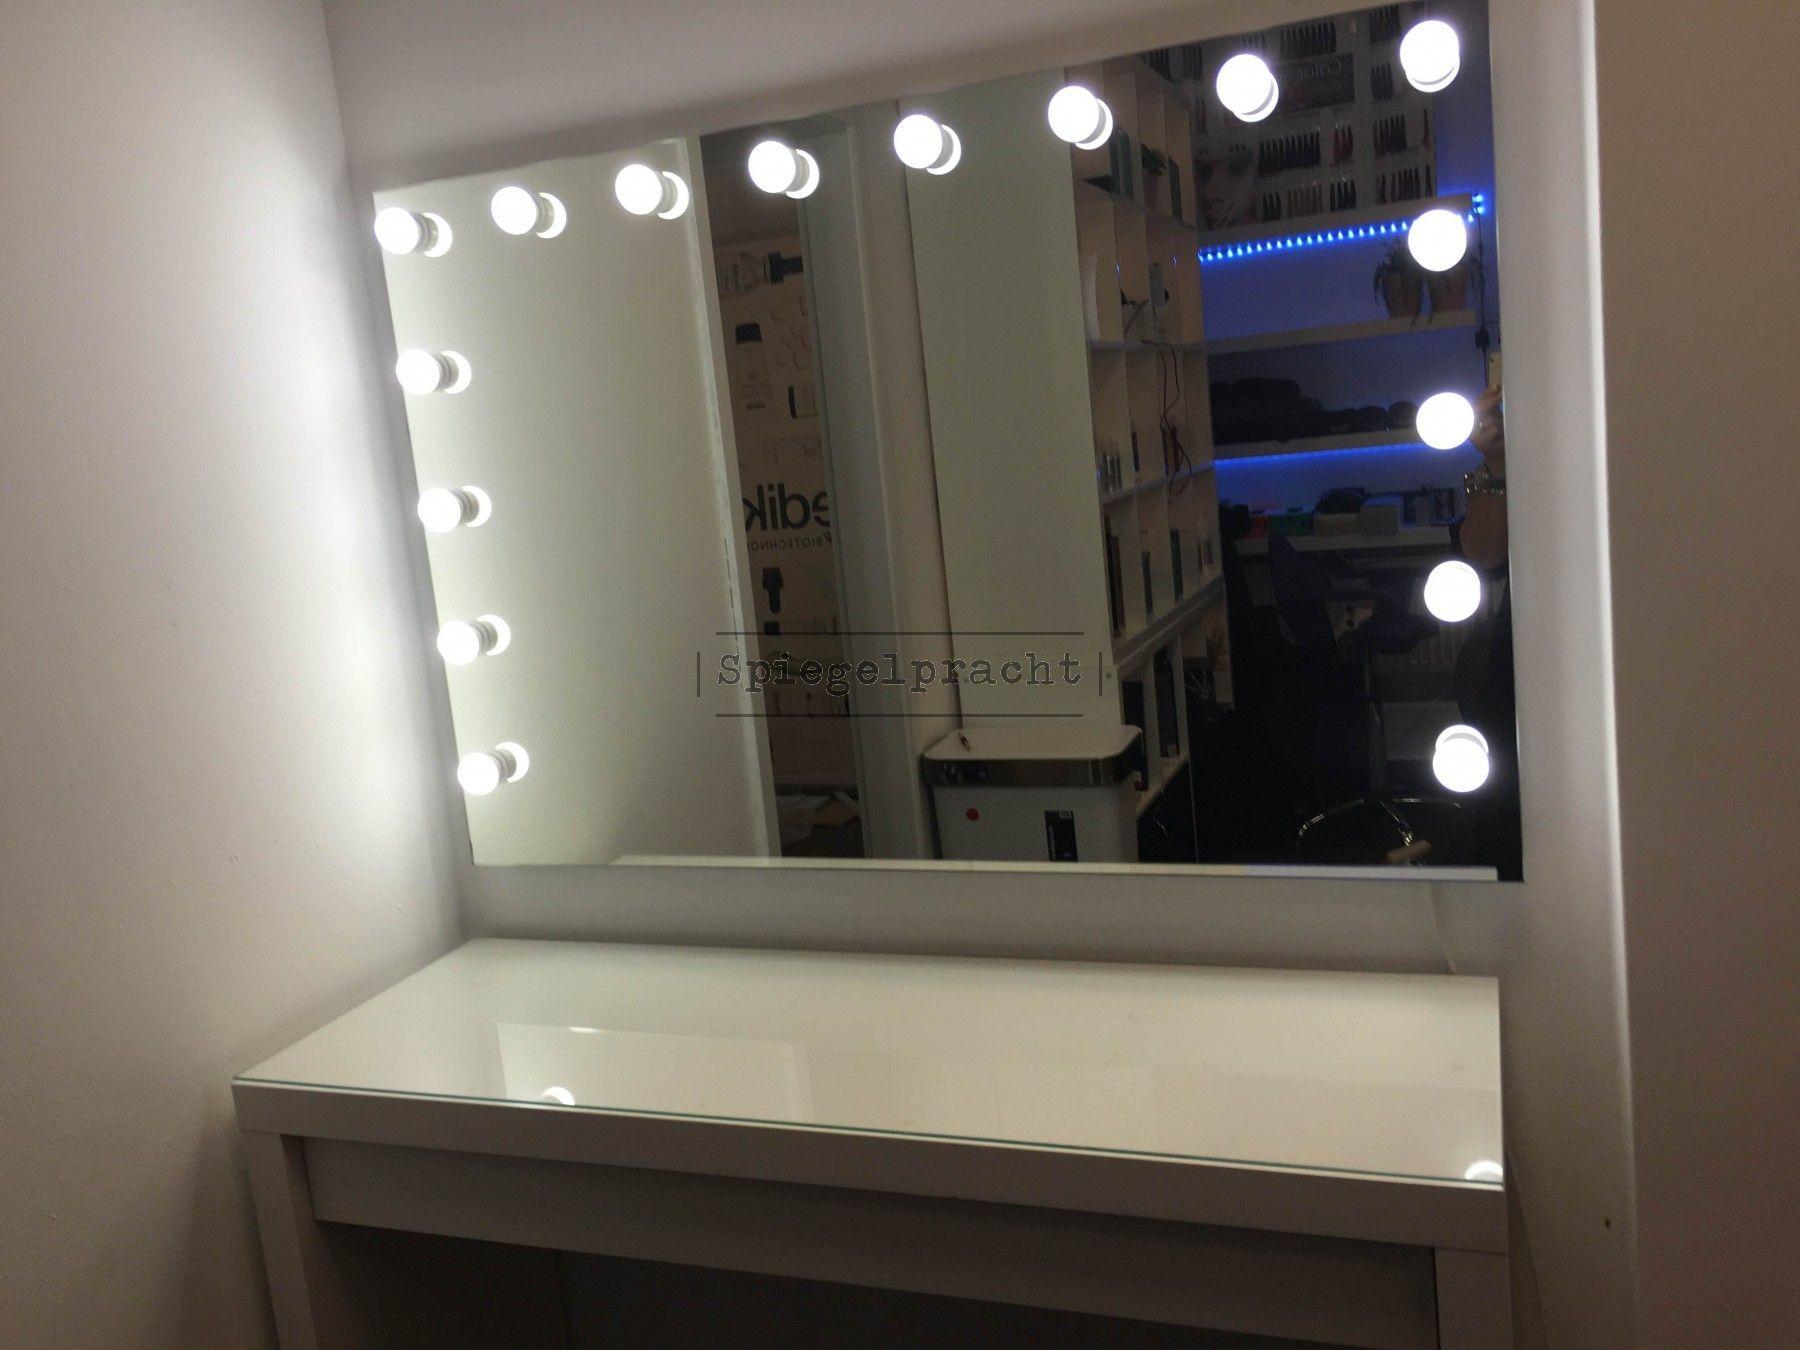 Make Up Spiegel : Roze led make up spiegel met verlichting led lichtjes postdrogist